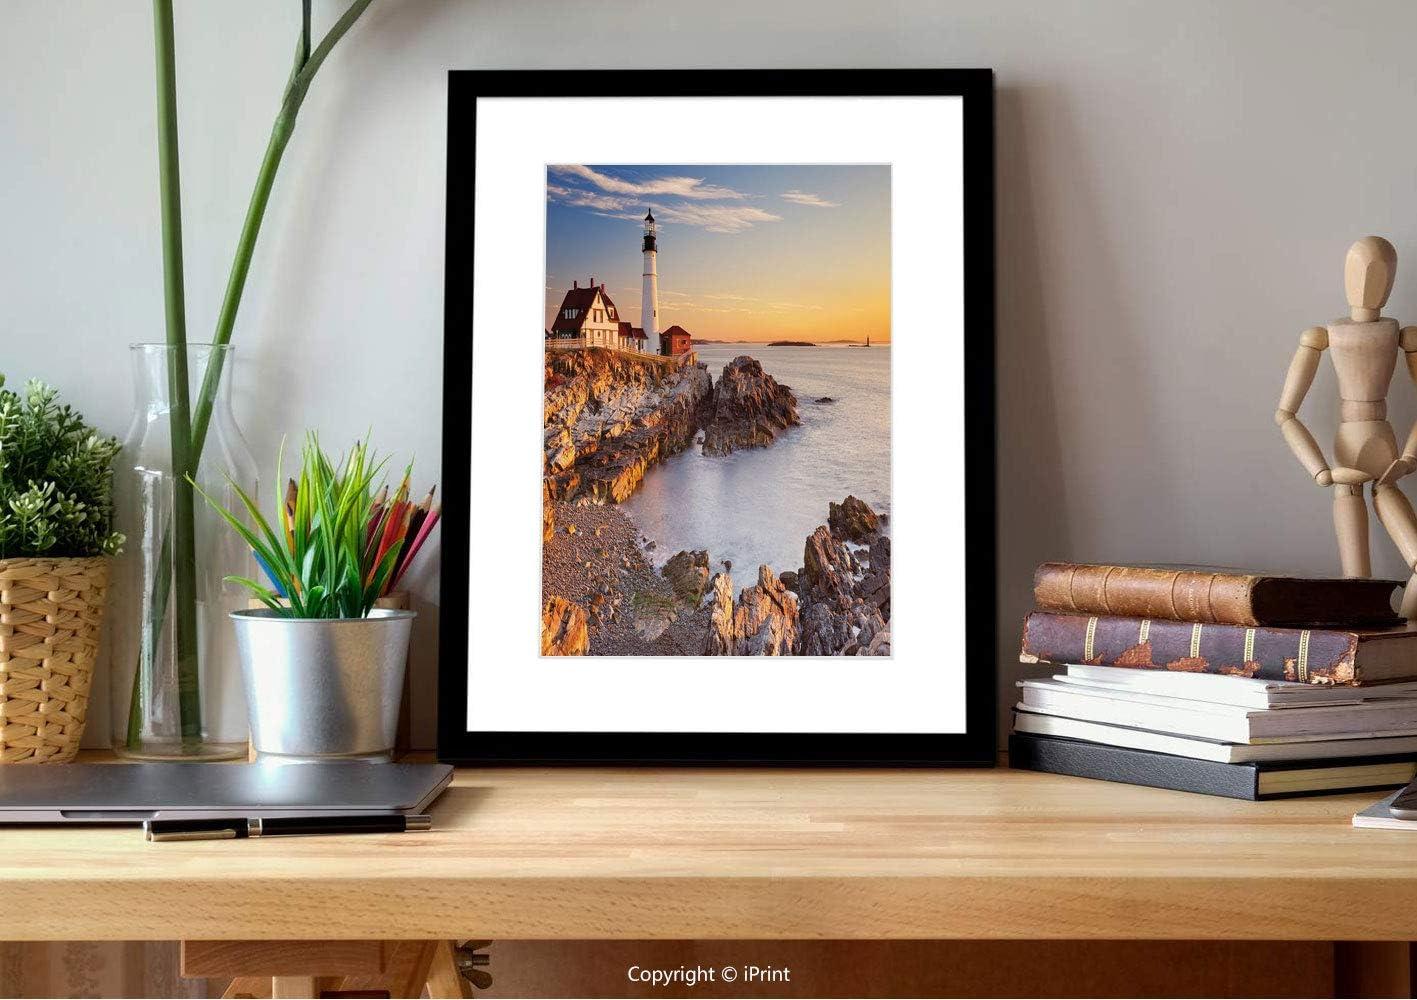 №23422 Wall Kunst mit Frame,United States,Cape Elizabeth Maine River Portland Lighthouse Sunrise Usa Coast Scenery, Blue Tan, Gifts